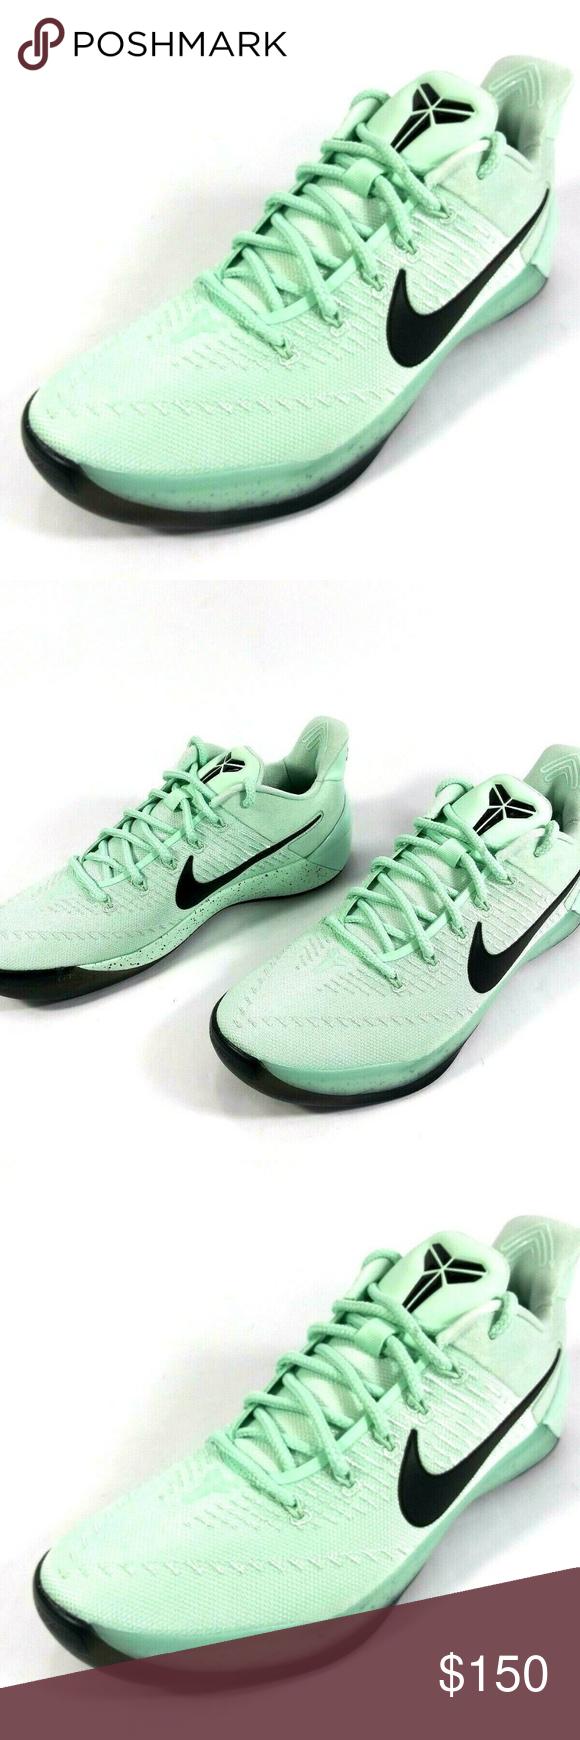 37b6d80f5a0 Nike Kobe A.D. Igloo 852425-300 Nike Kobe A.D. Igloo 852425-300 Basketball  Shoes